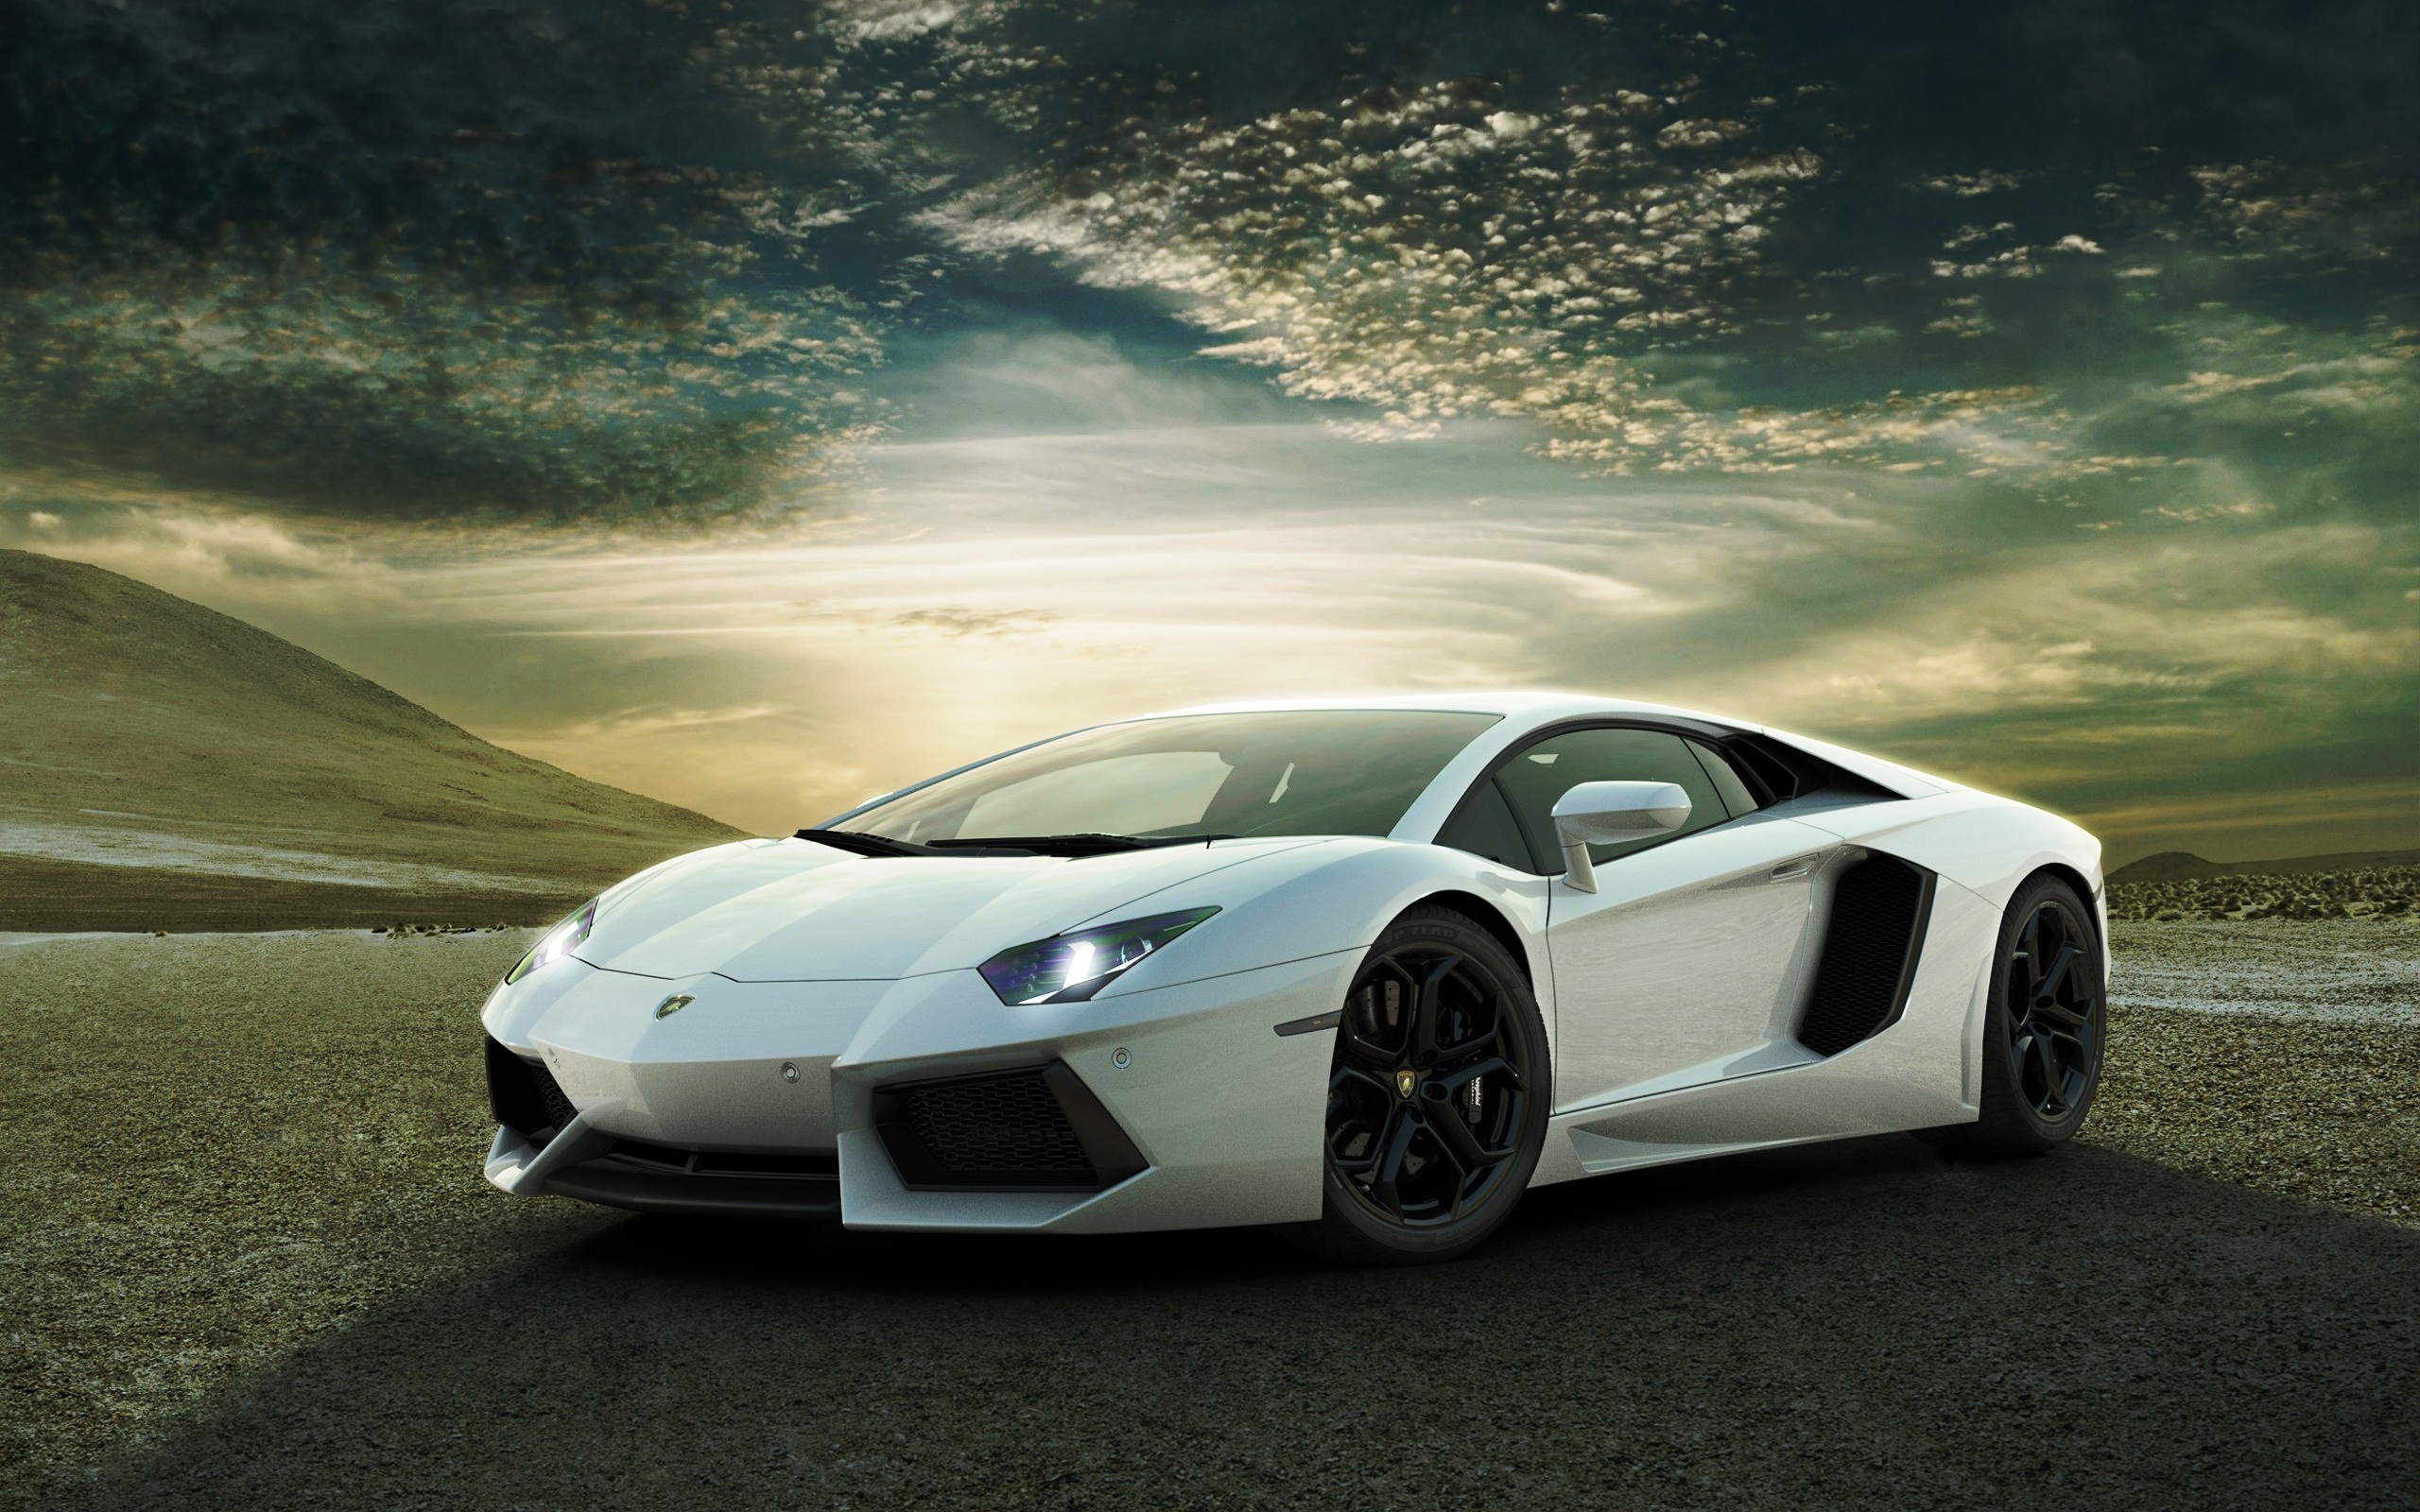 Lamborghini Aventador Wallpapers A43